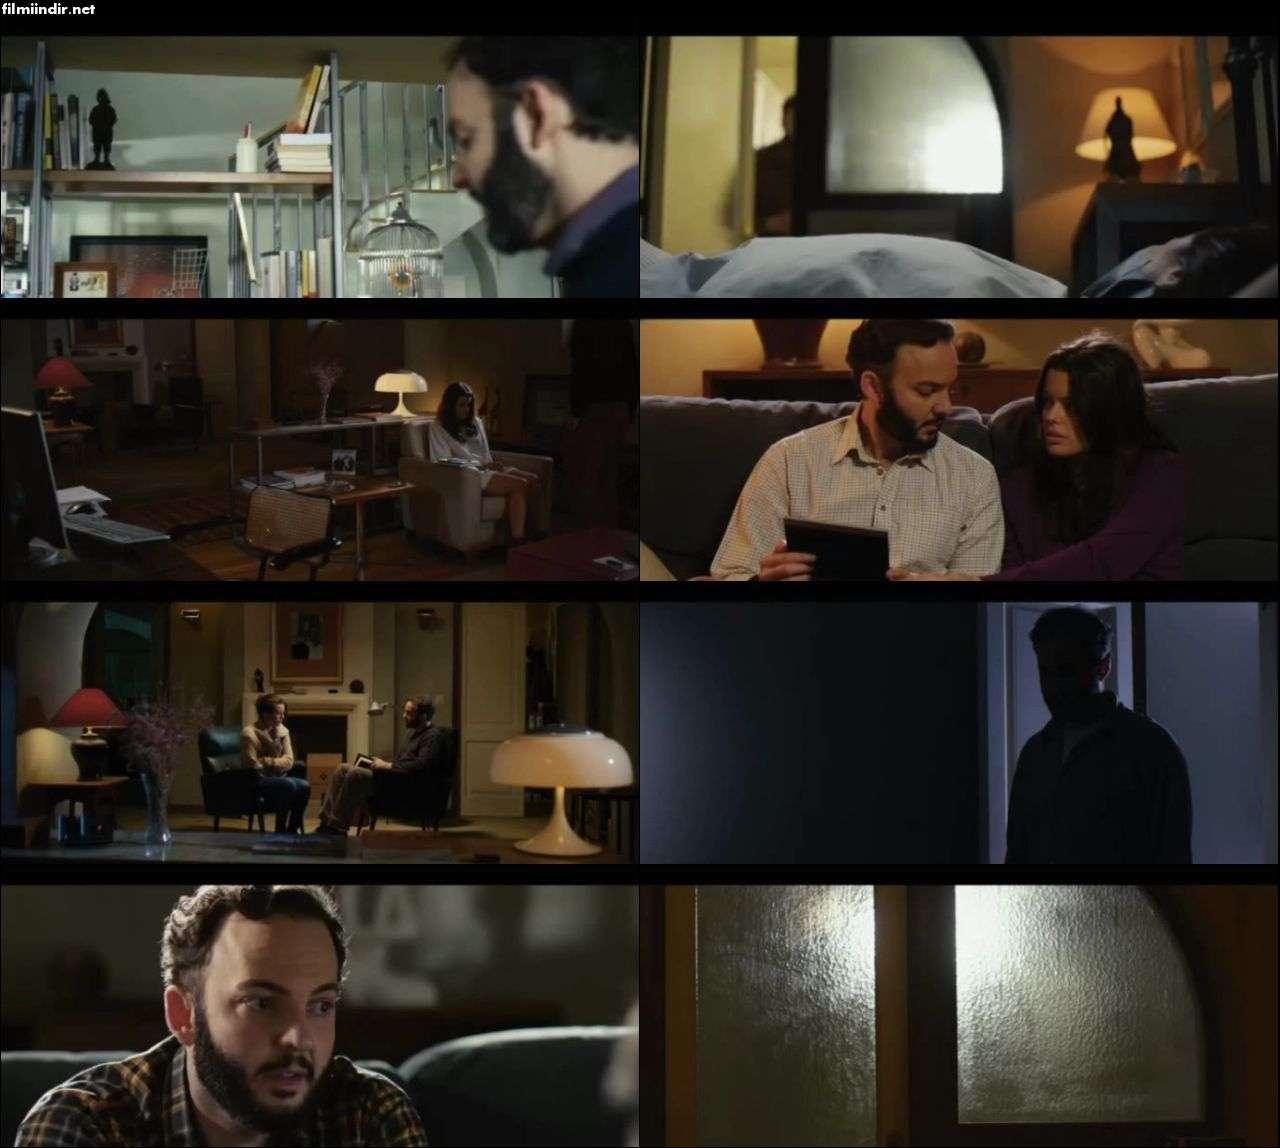 Sığınak - The Writer's Burrow - La madriguera (2016) türkçe dublaj hd film indir